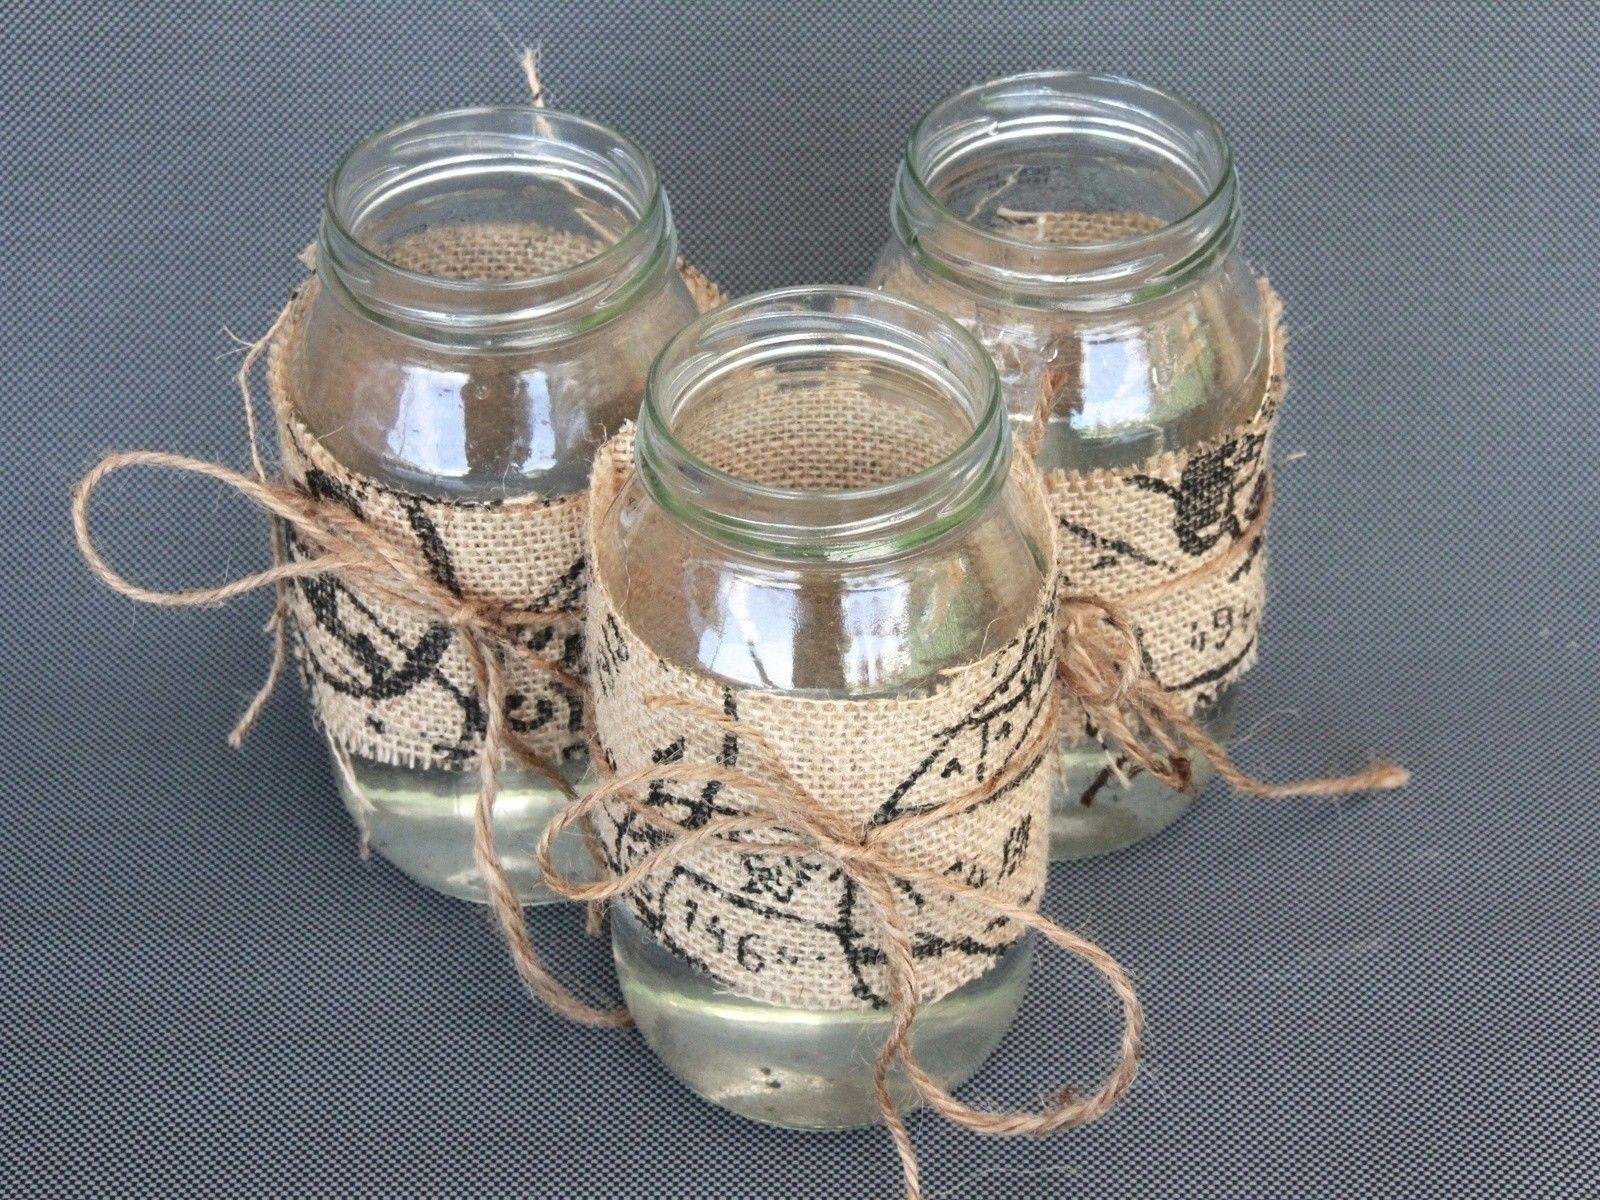 Diy Centrepiece Ideas Glass Jars Decorated With Burlap